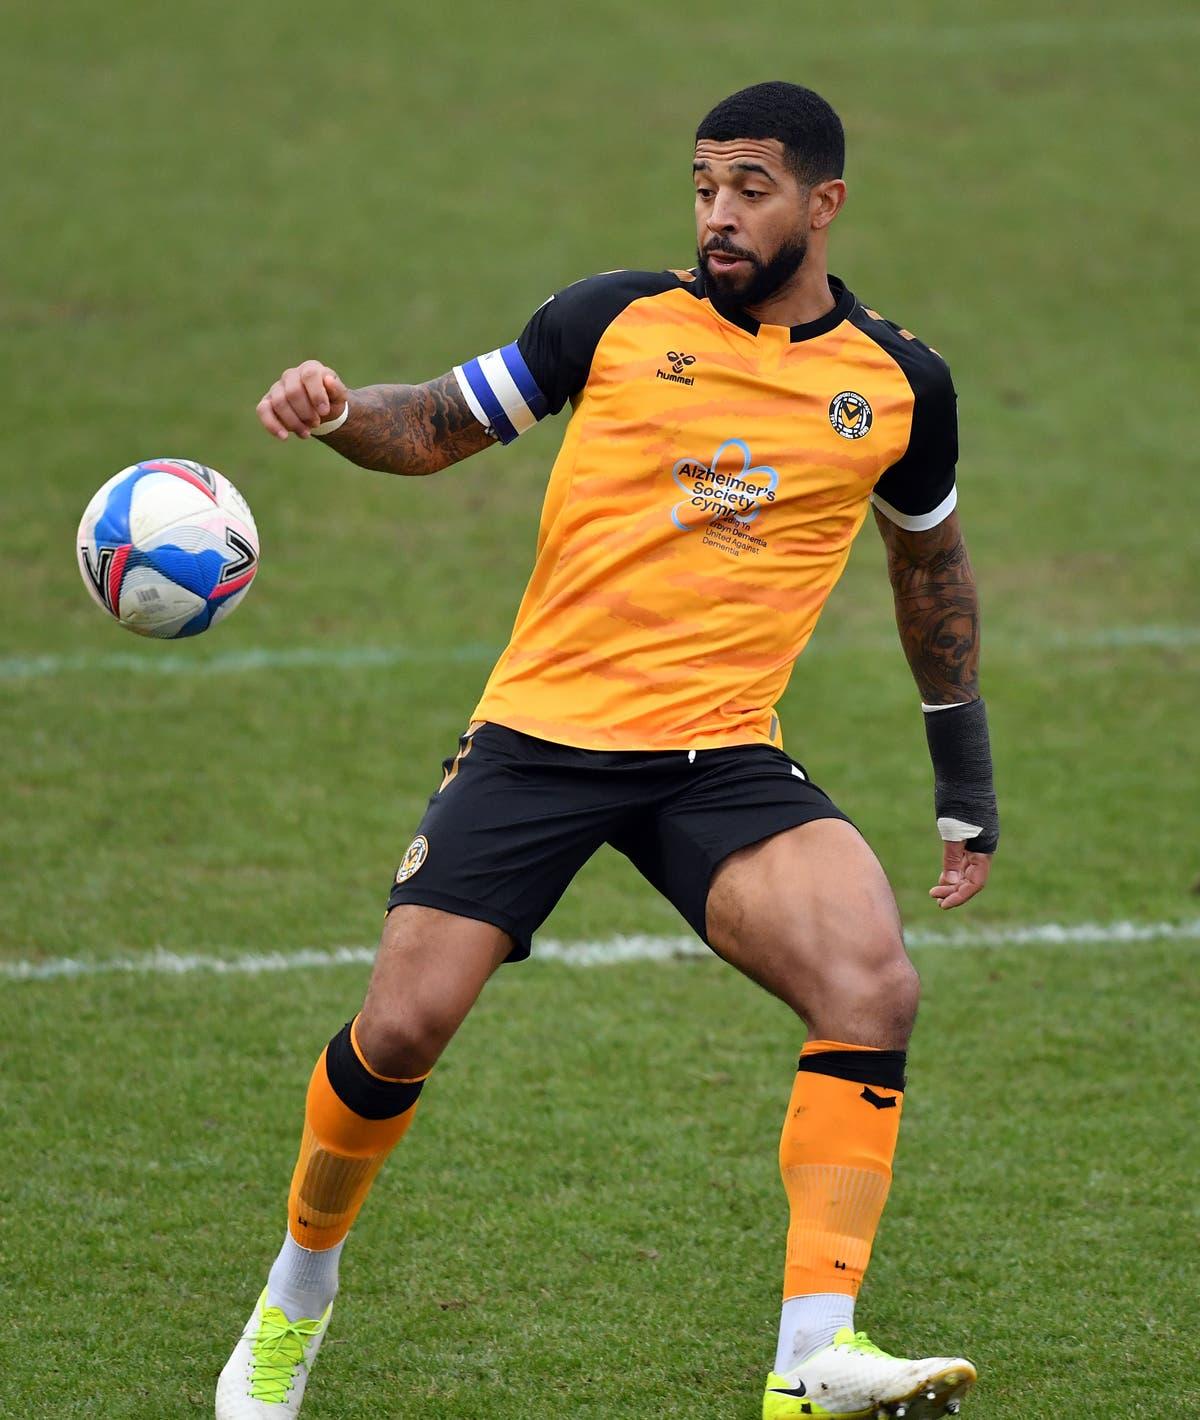 Newport captain Joss Labadie set to start play-off final against Morecambe